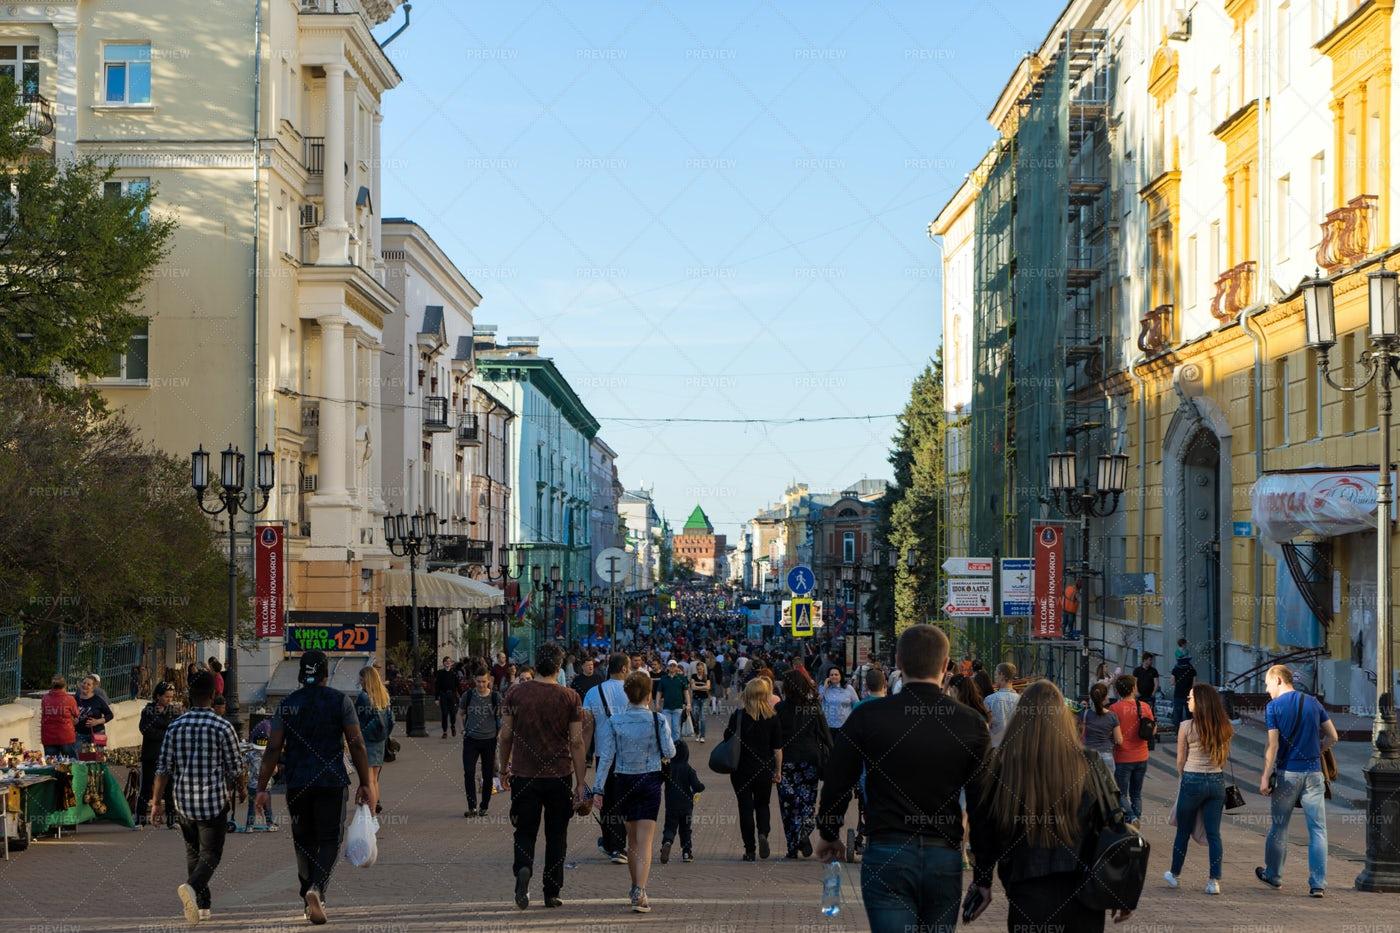 People On Nizhny Novgorod Streets: Stock Photos